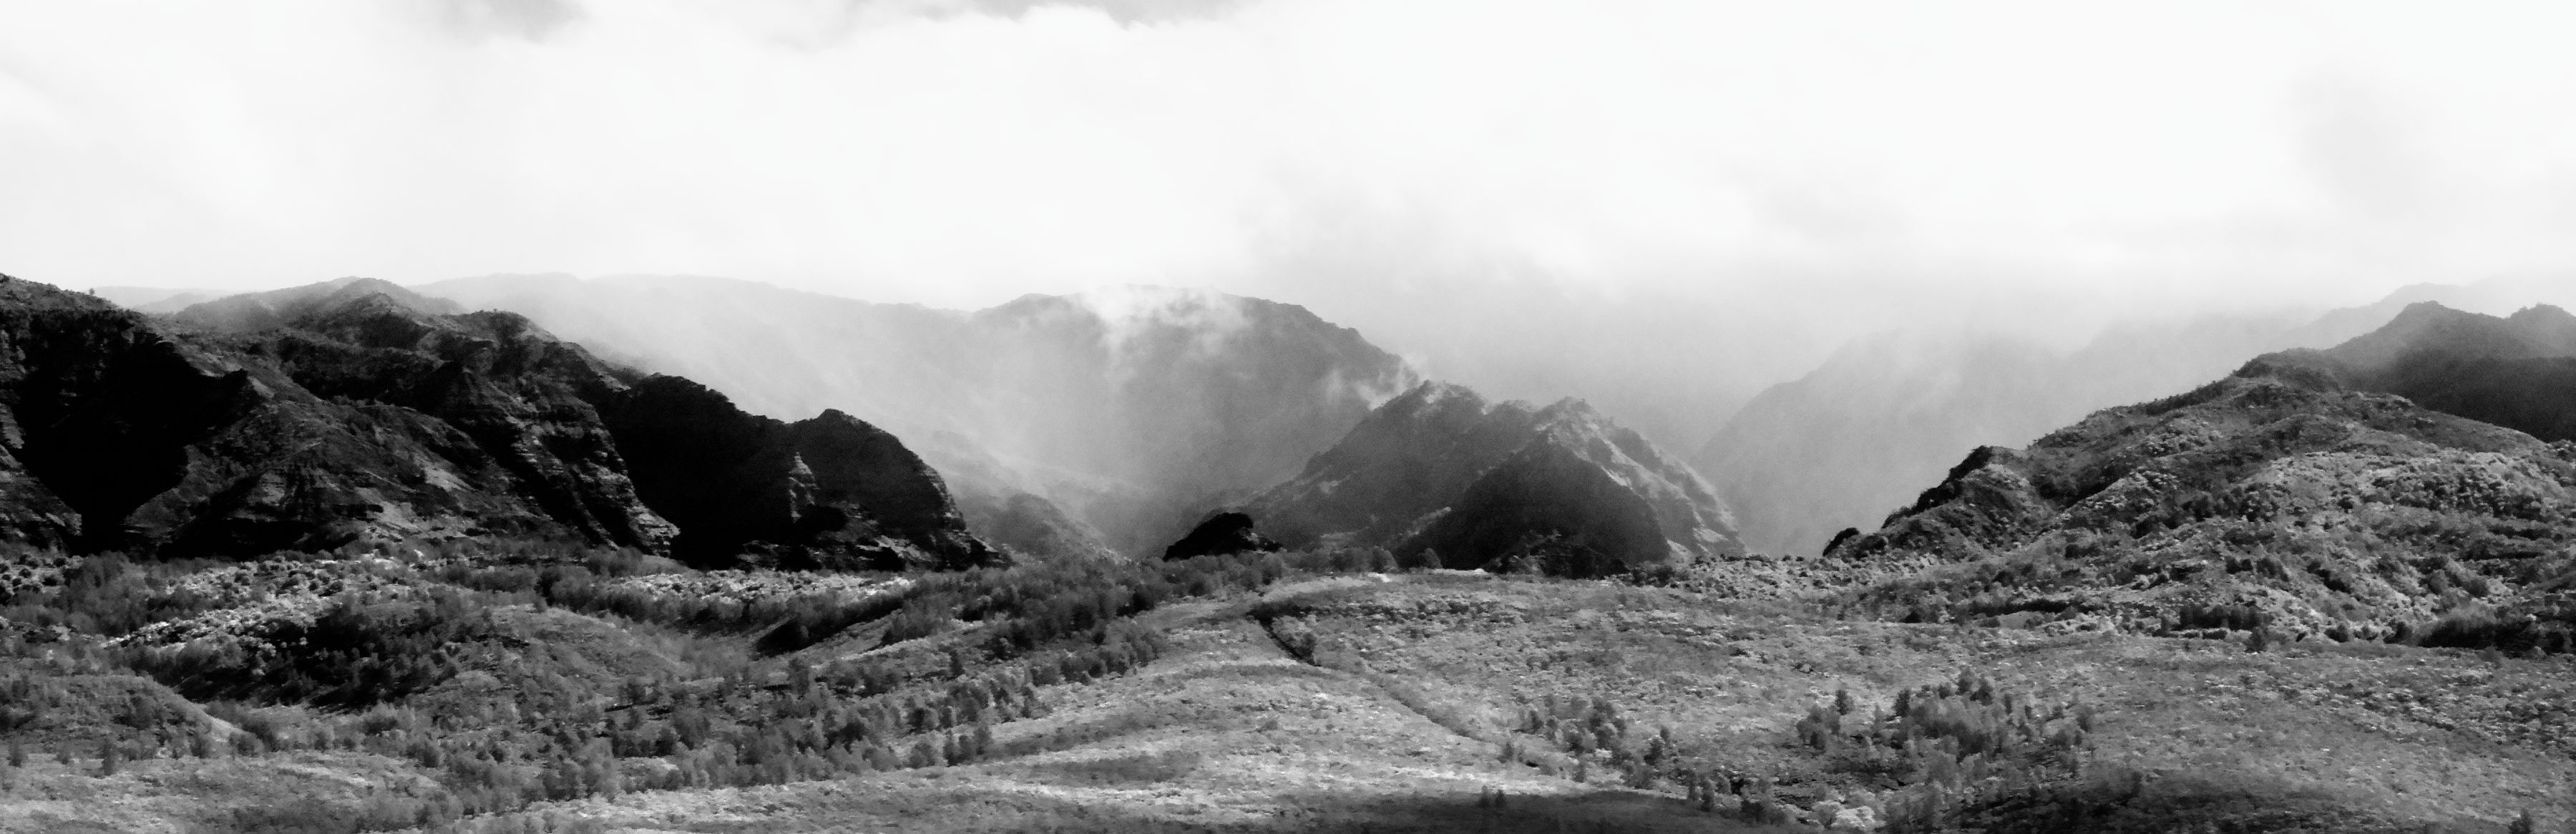 Waimea Canyon, en noir et blanc